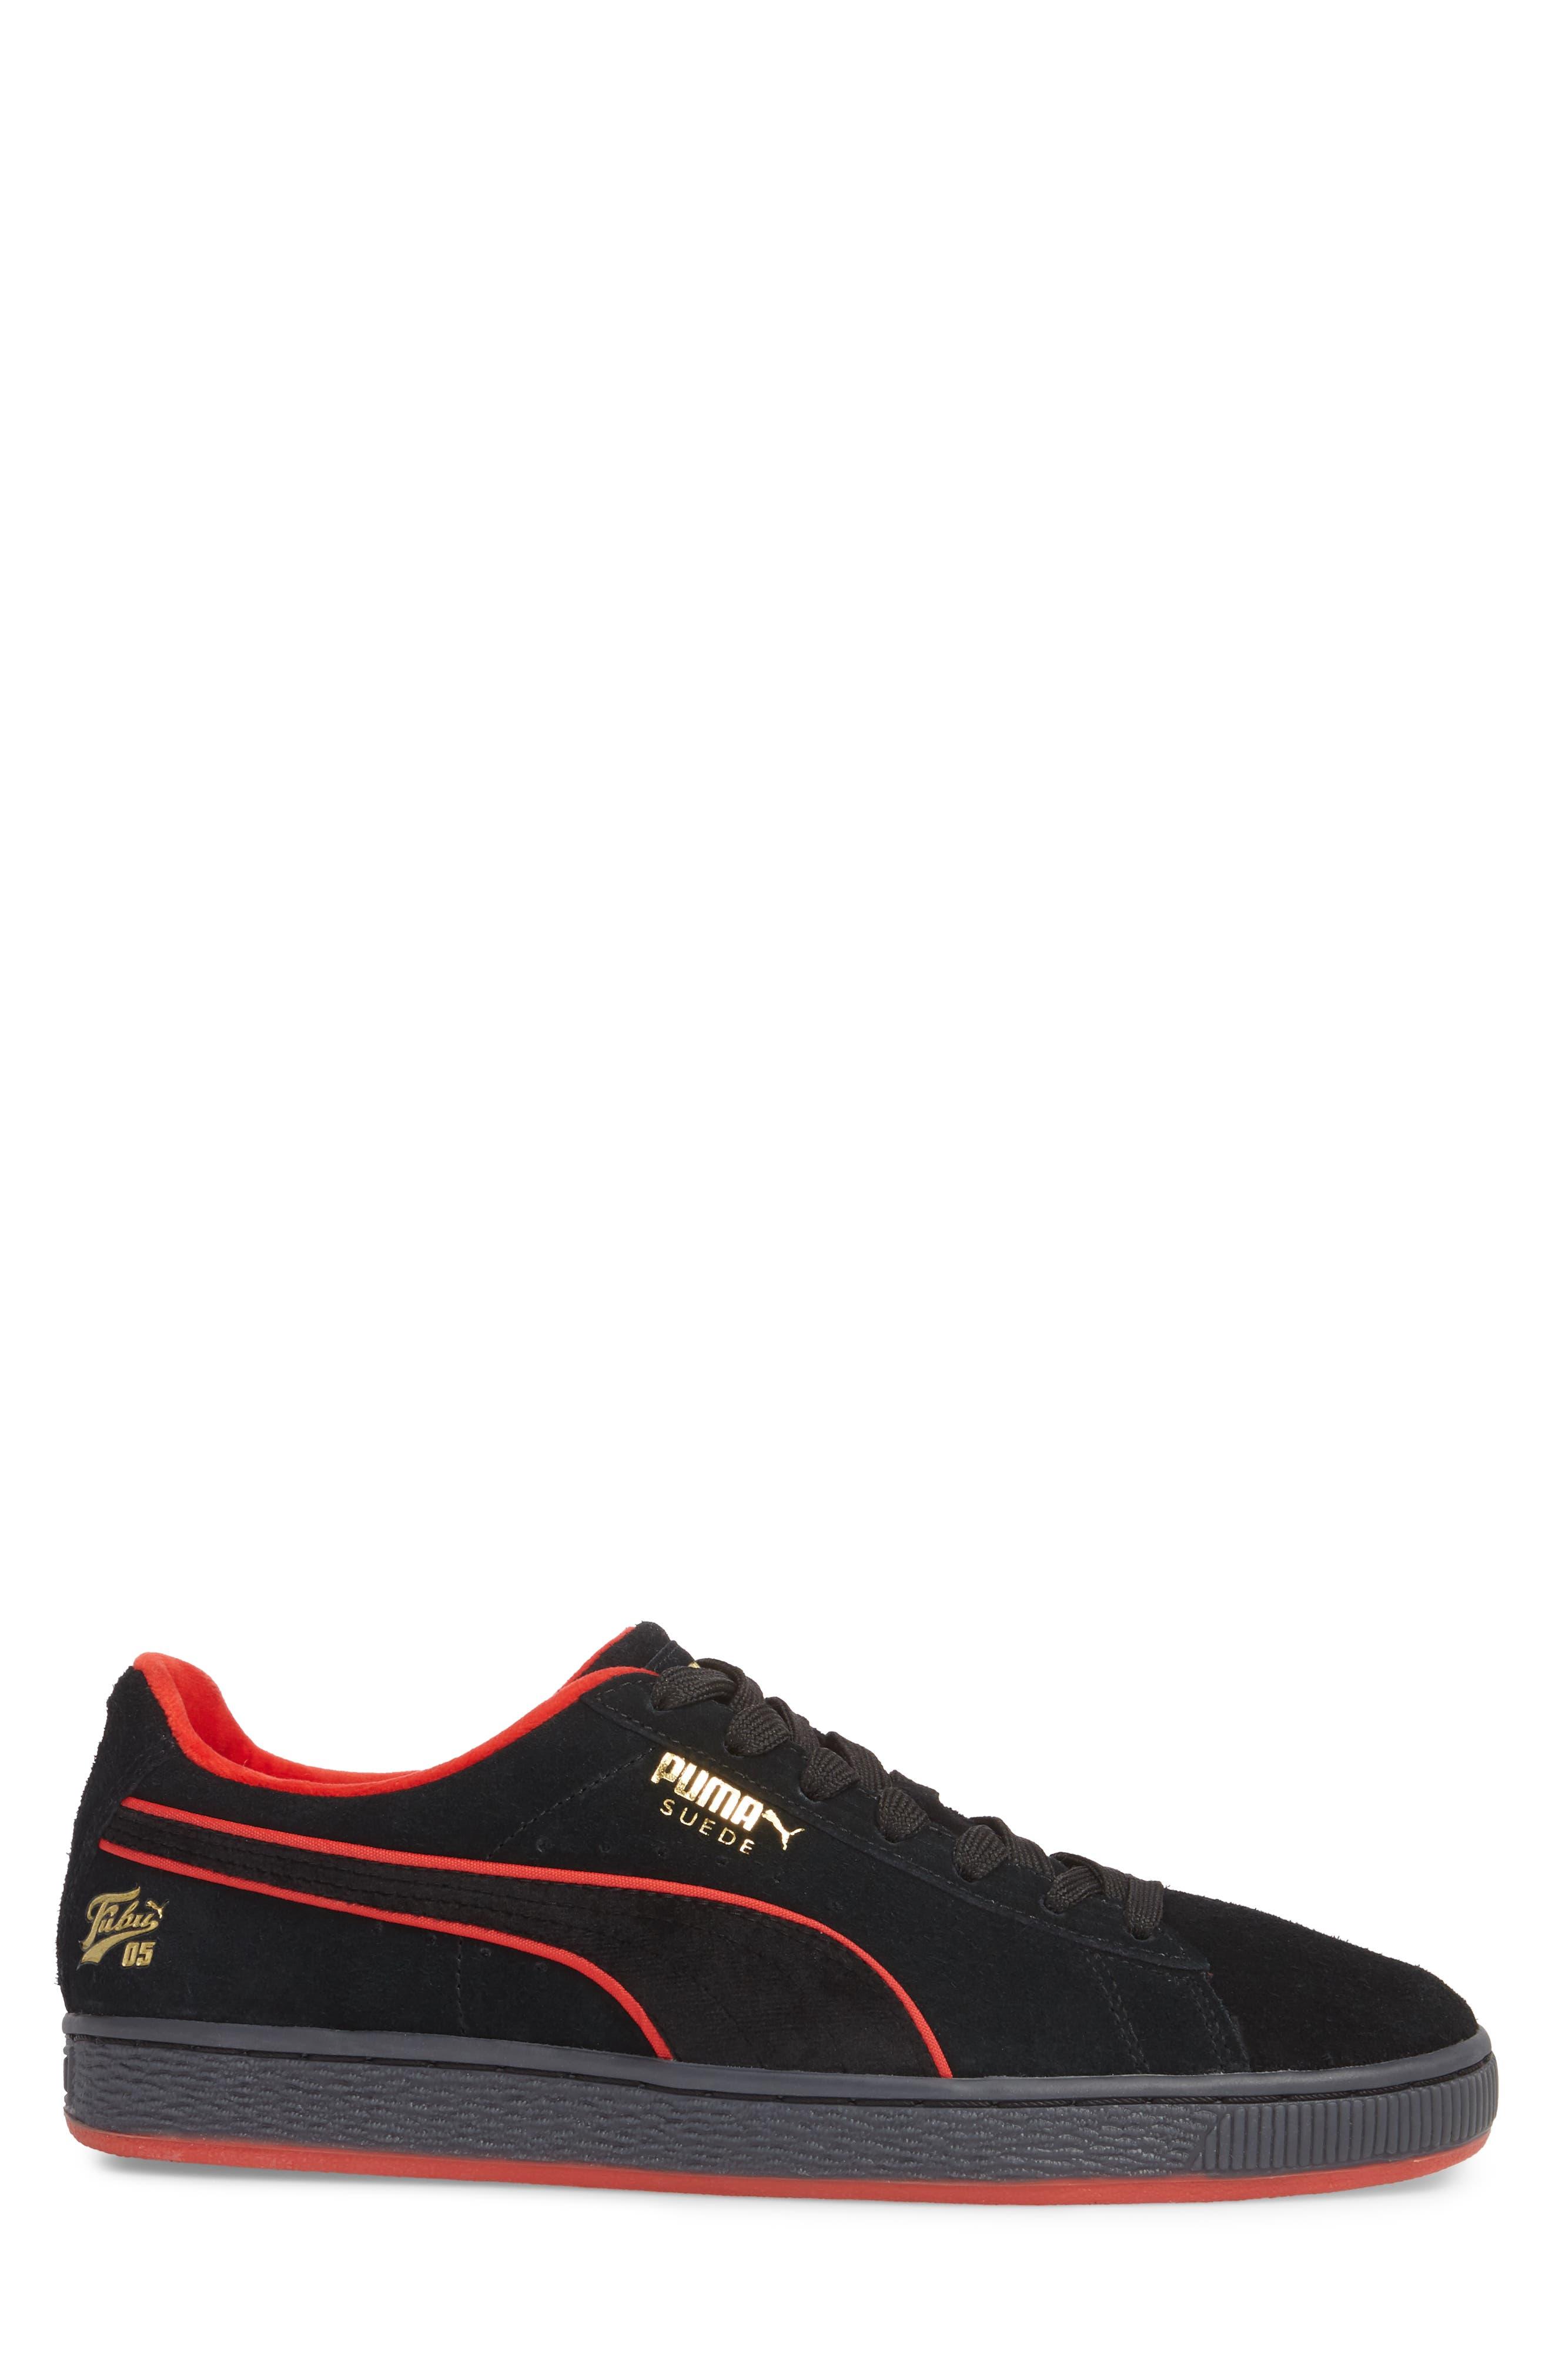 x FUBU Suede Classic Sneaker,                             Alternate thumbnail 3, color,                             001